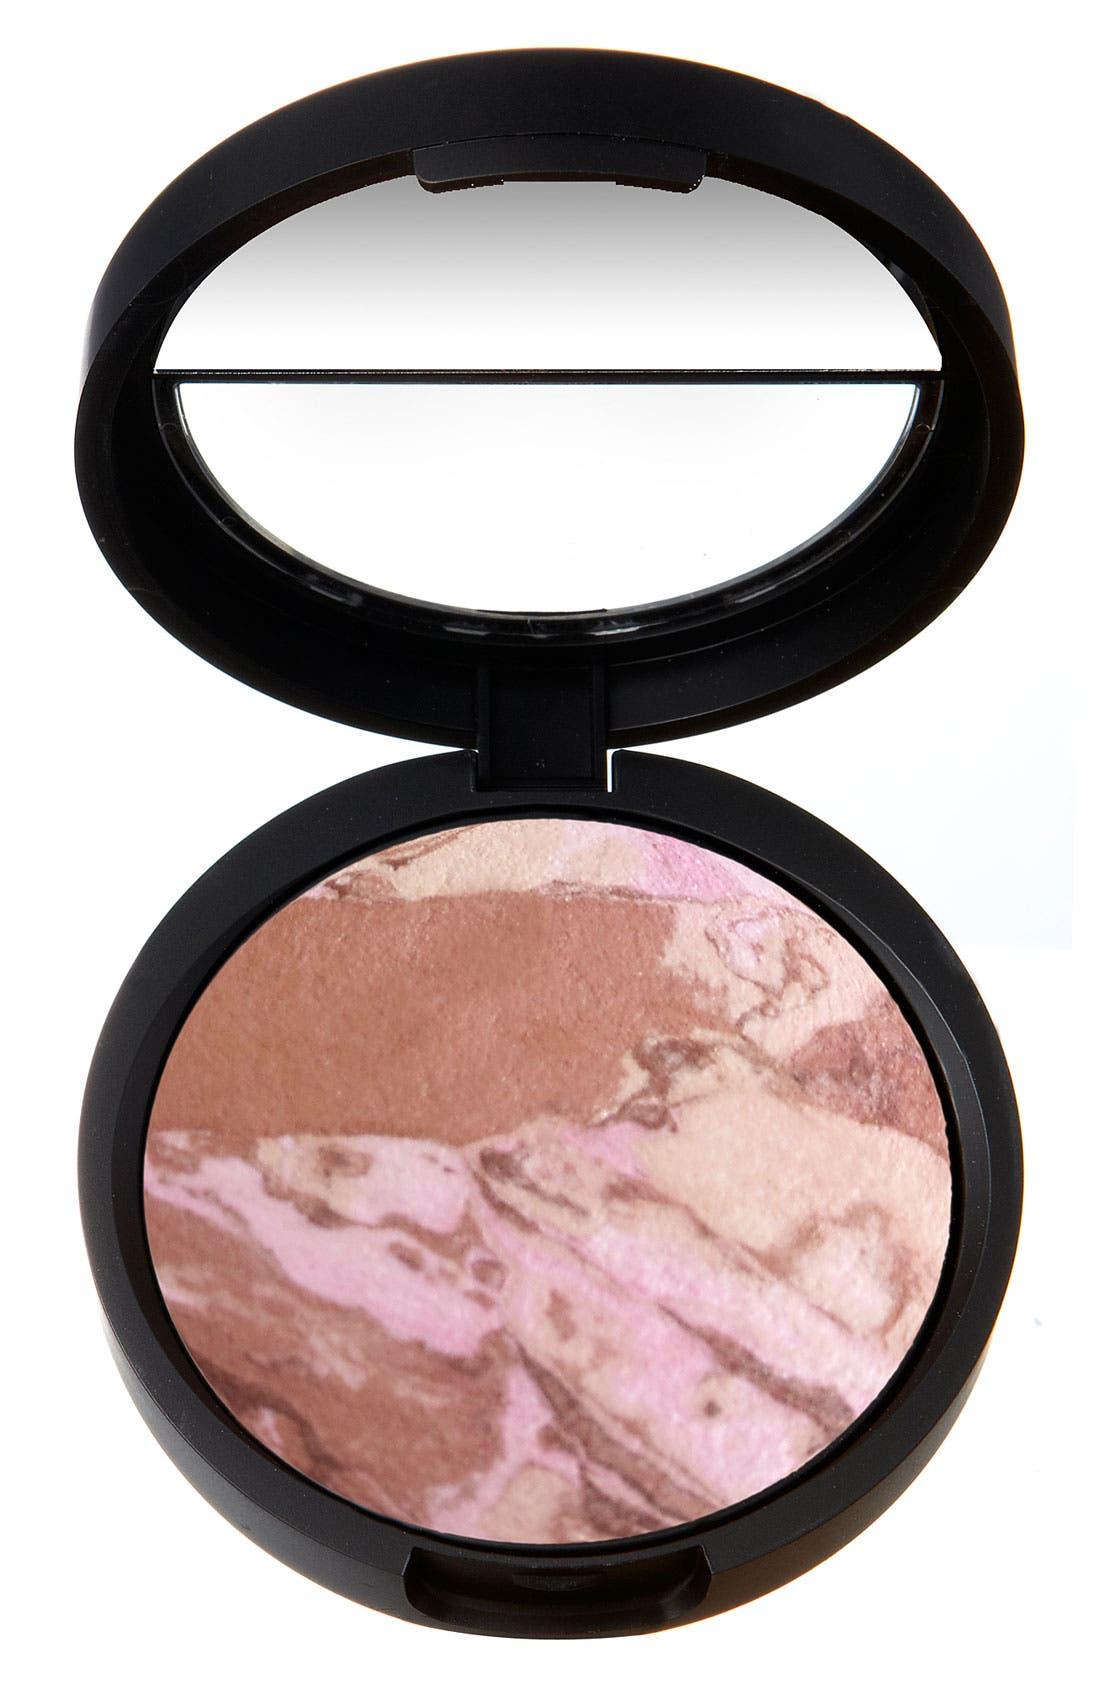 'Bronze-n-Brighten' Baked Color Correcting Bronzer,                             Main thumbnail 1, color,                             MEDIUM